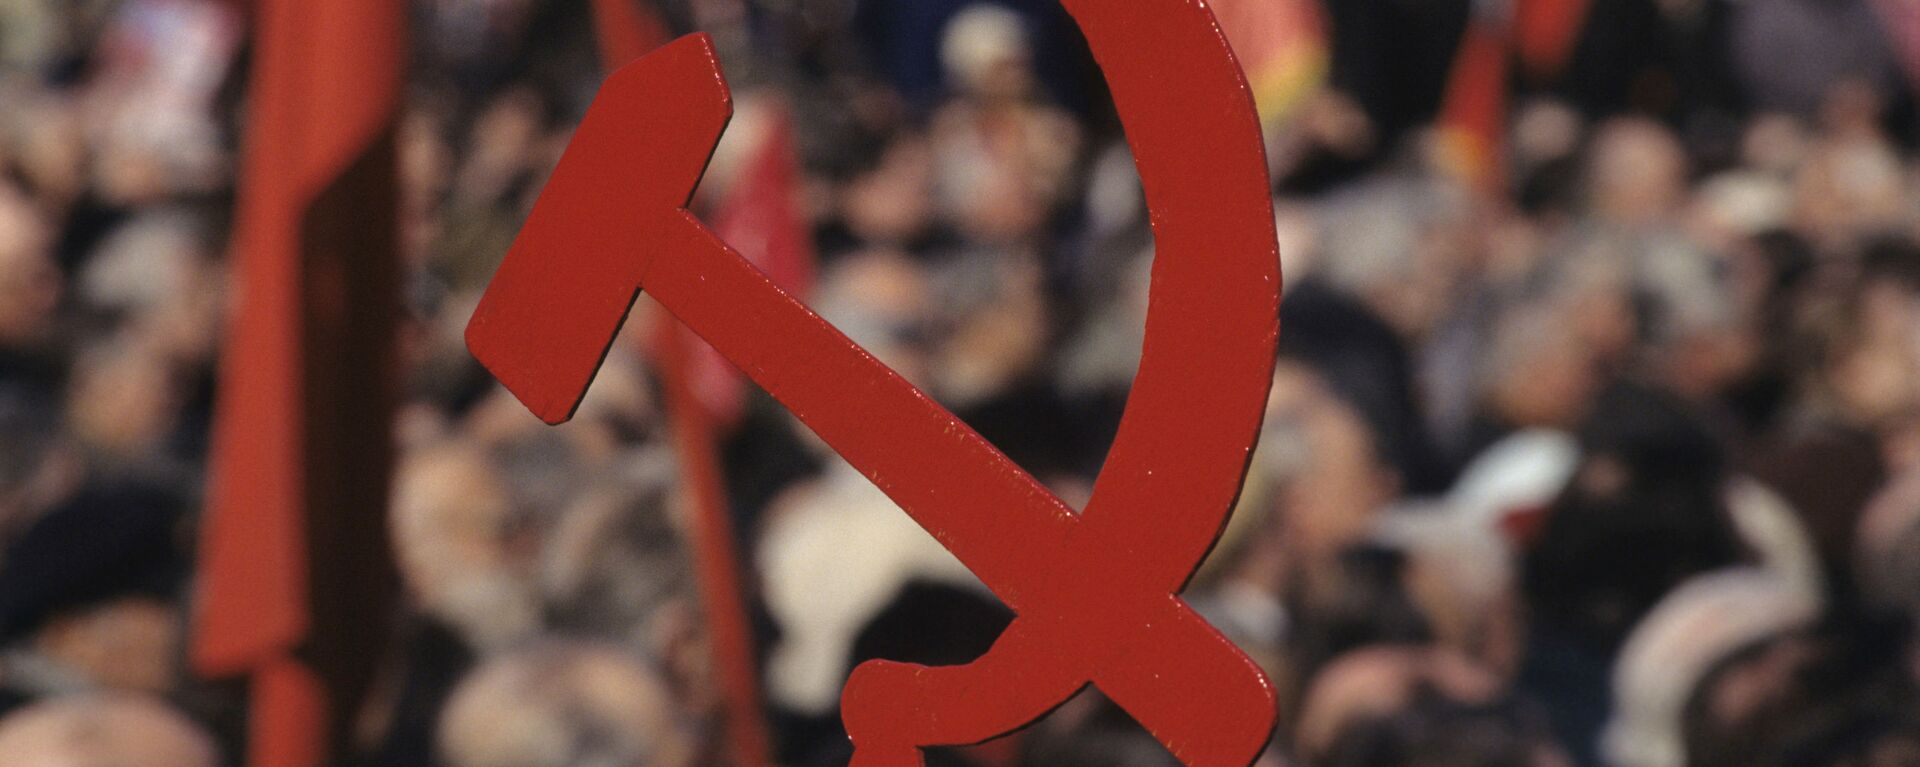 Митинг на Калужской площади в Москве - Sputnik Узбекистан, 1920, 05.03.2021